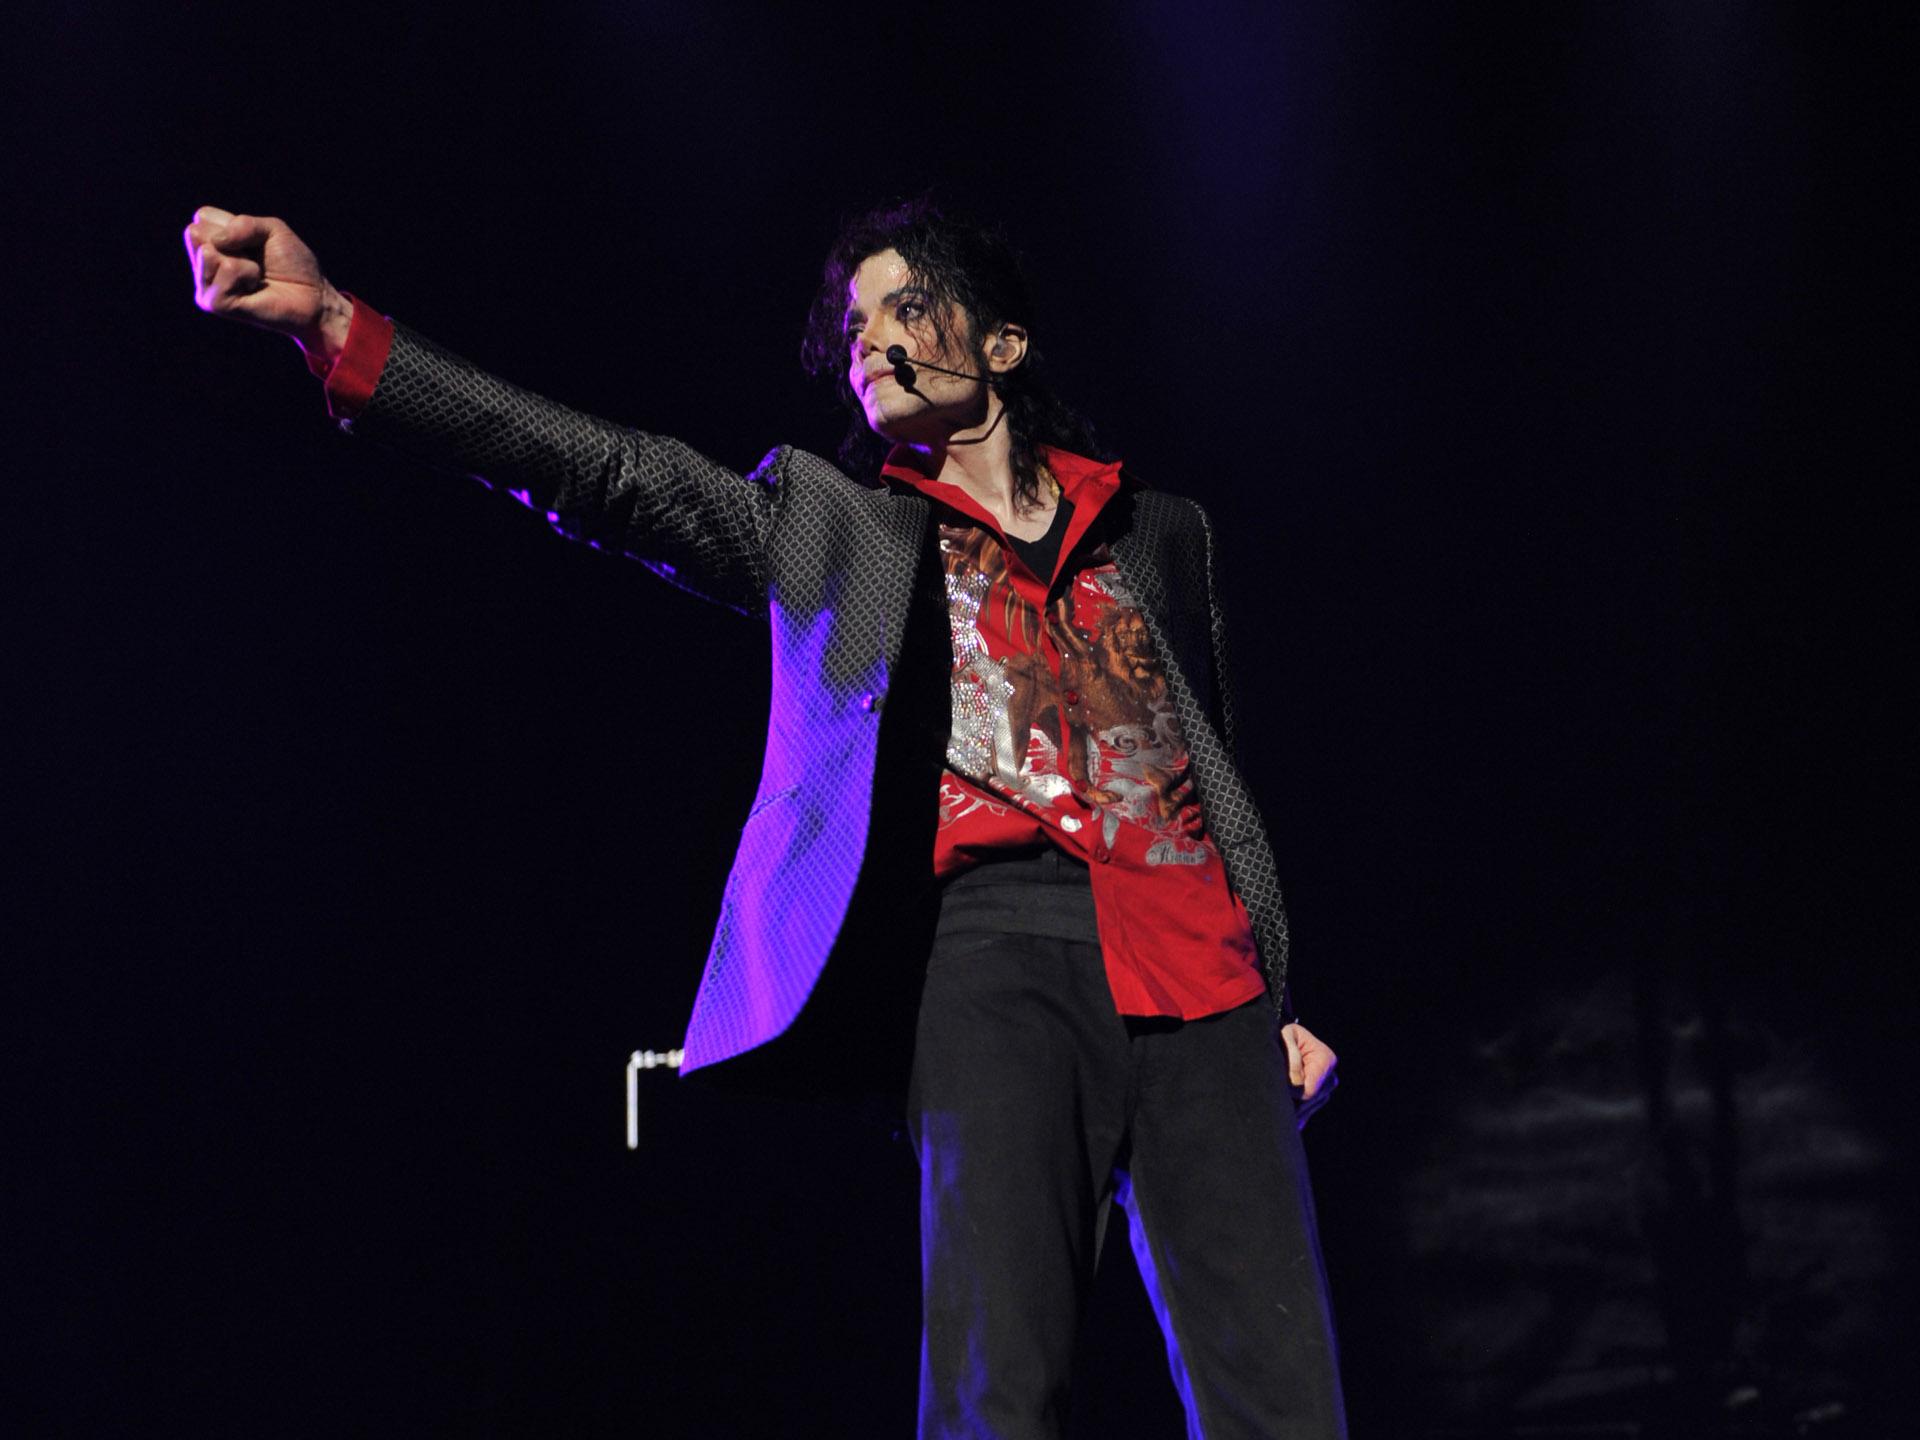 Película This is it de Michael Jackson